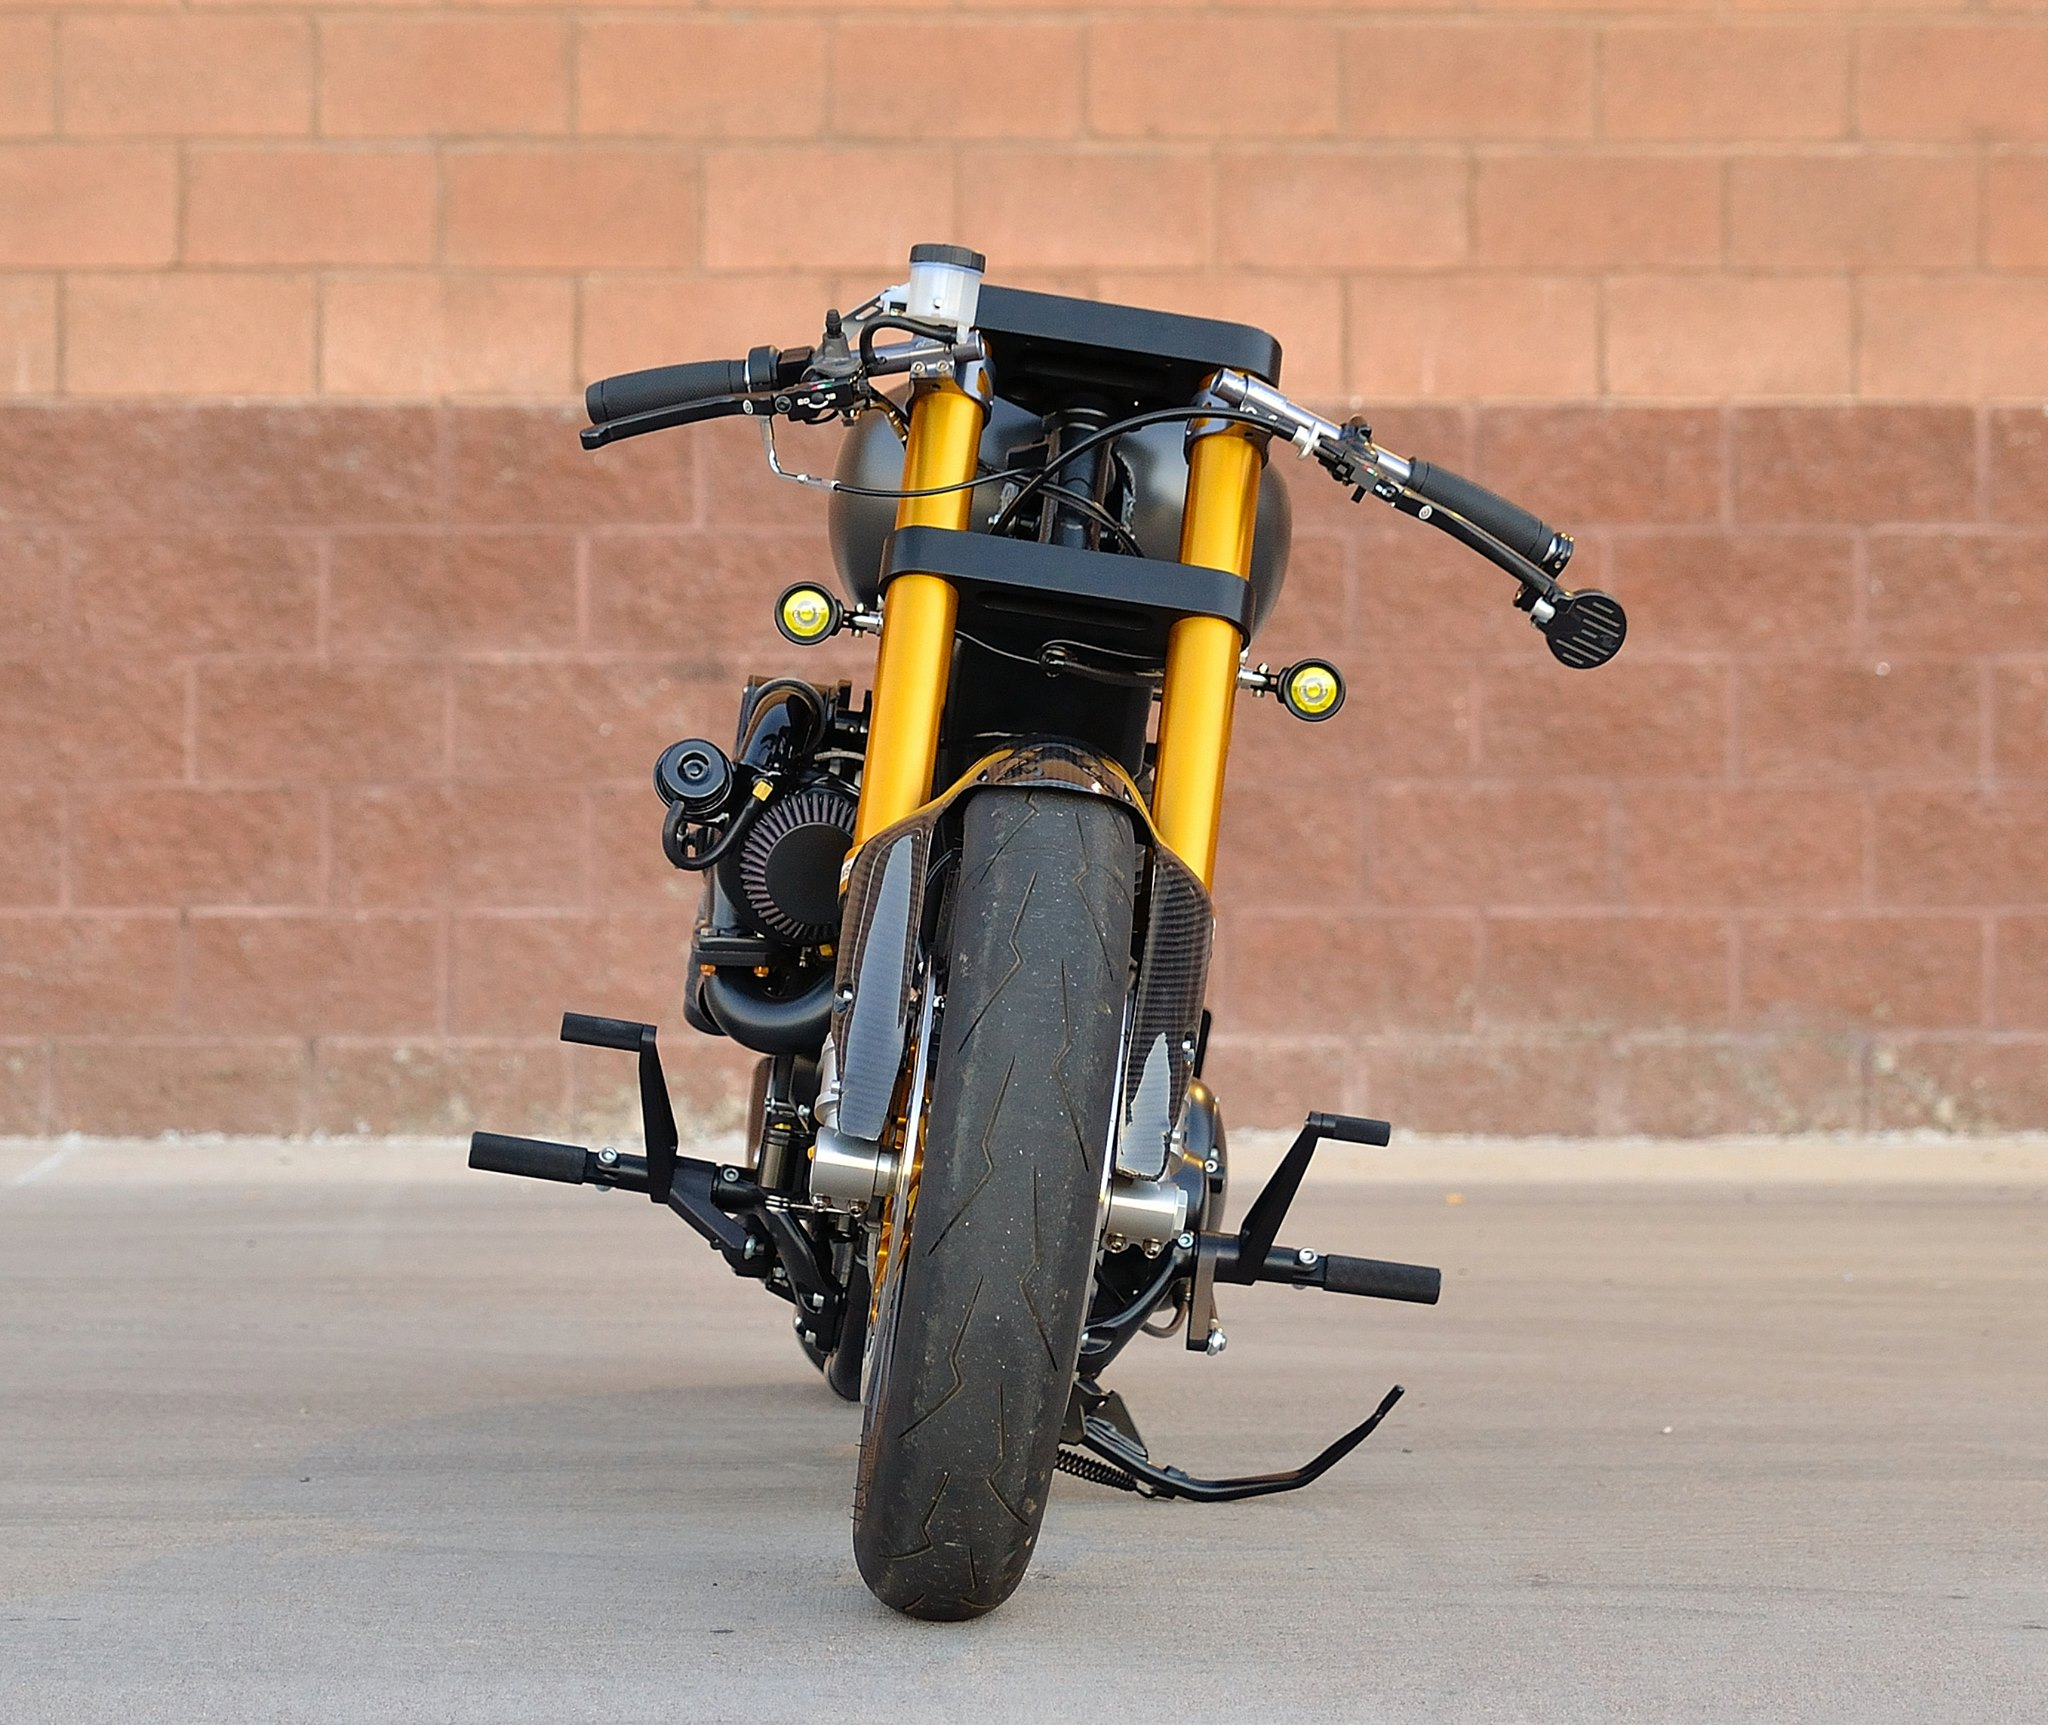 Harley Turbo Review: DP Customs Turbo Destroyer Harley Sportster